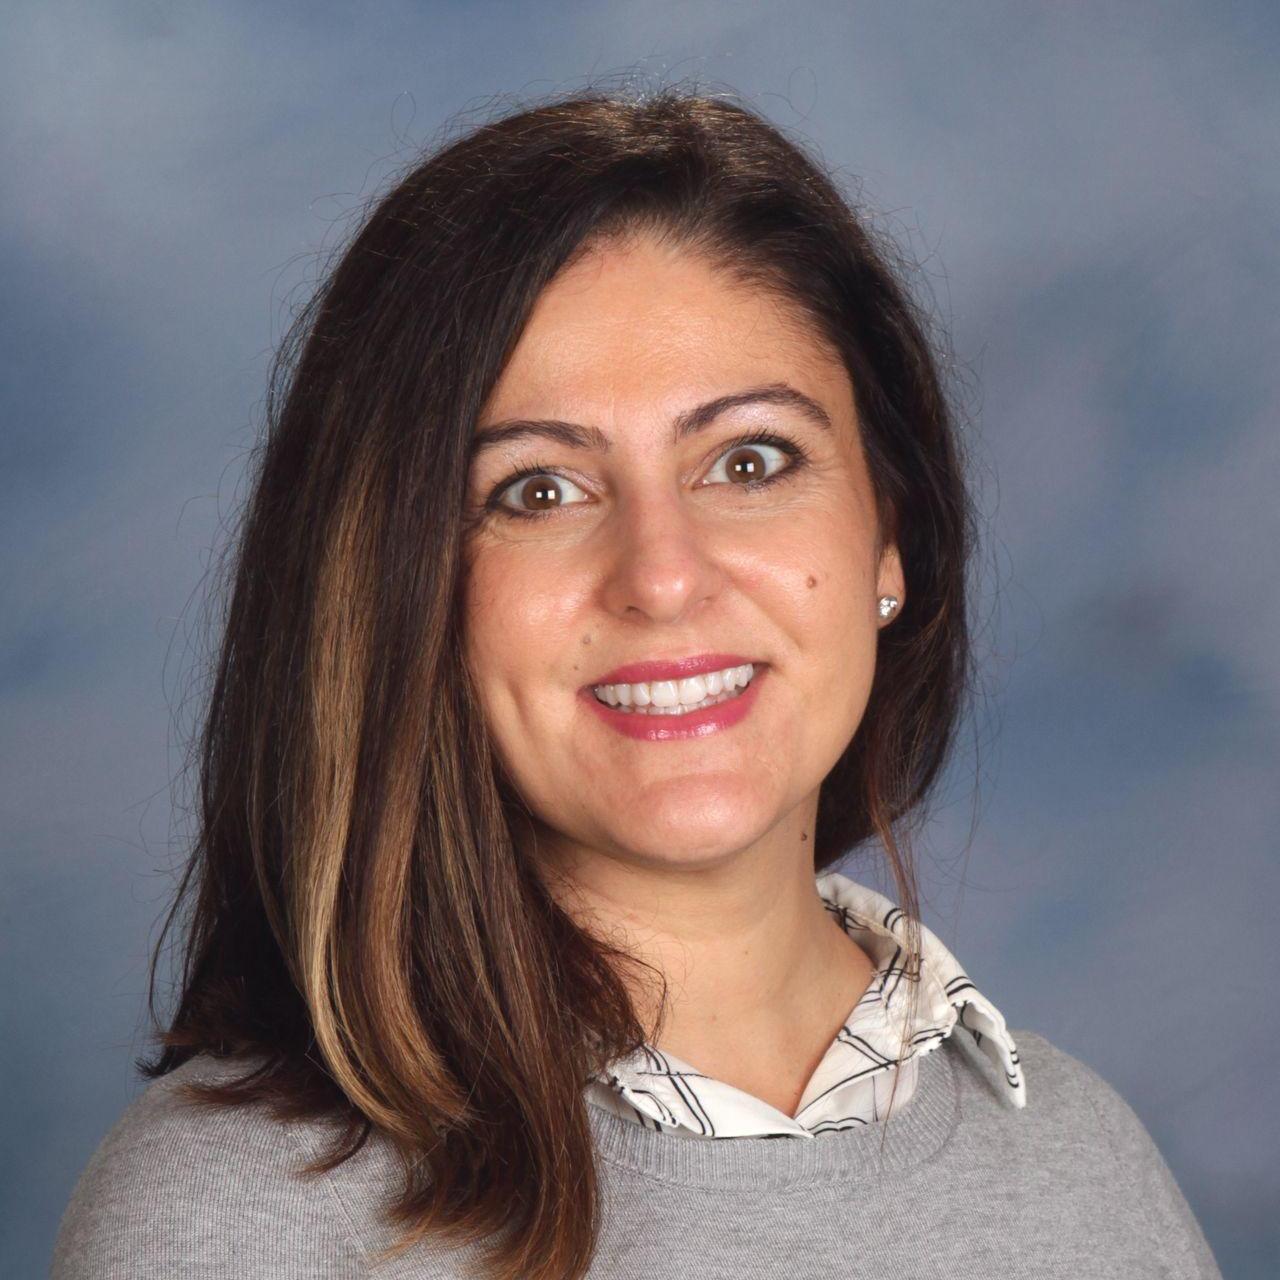 Mrs. Jessica Cutrona